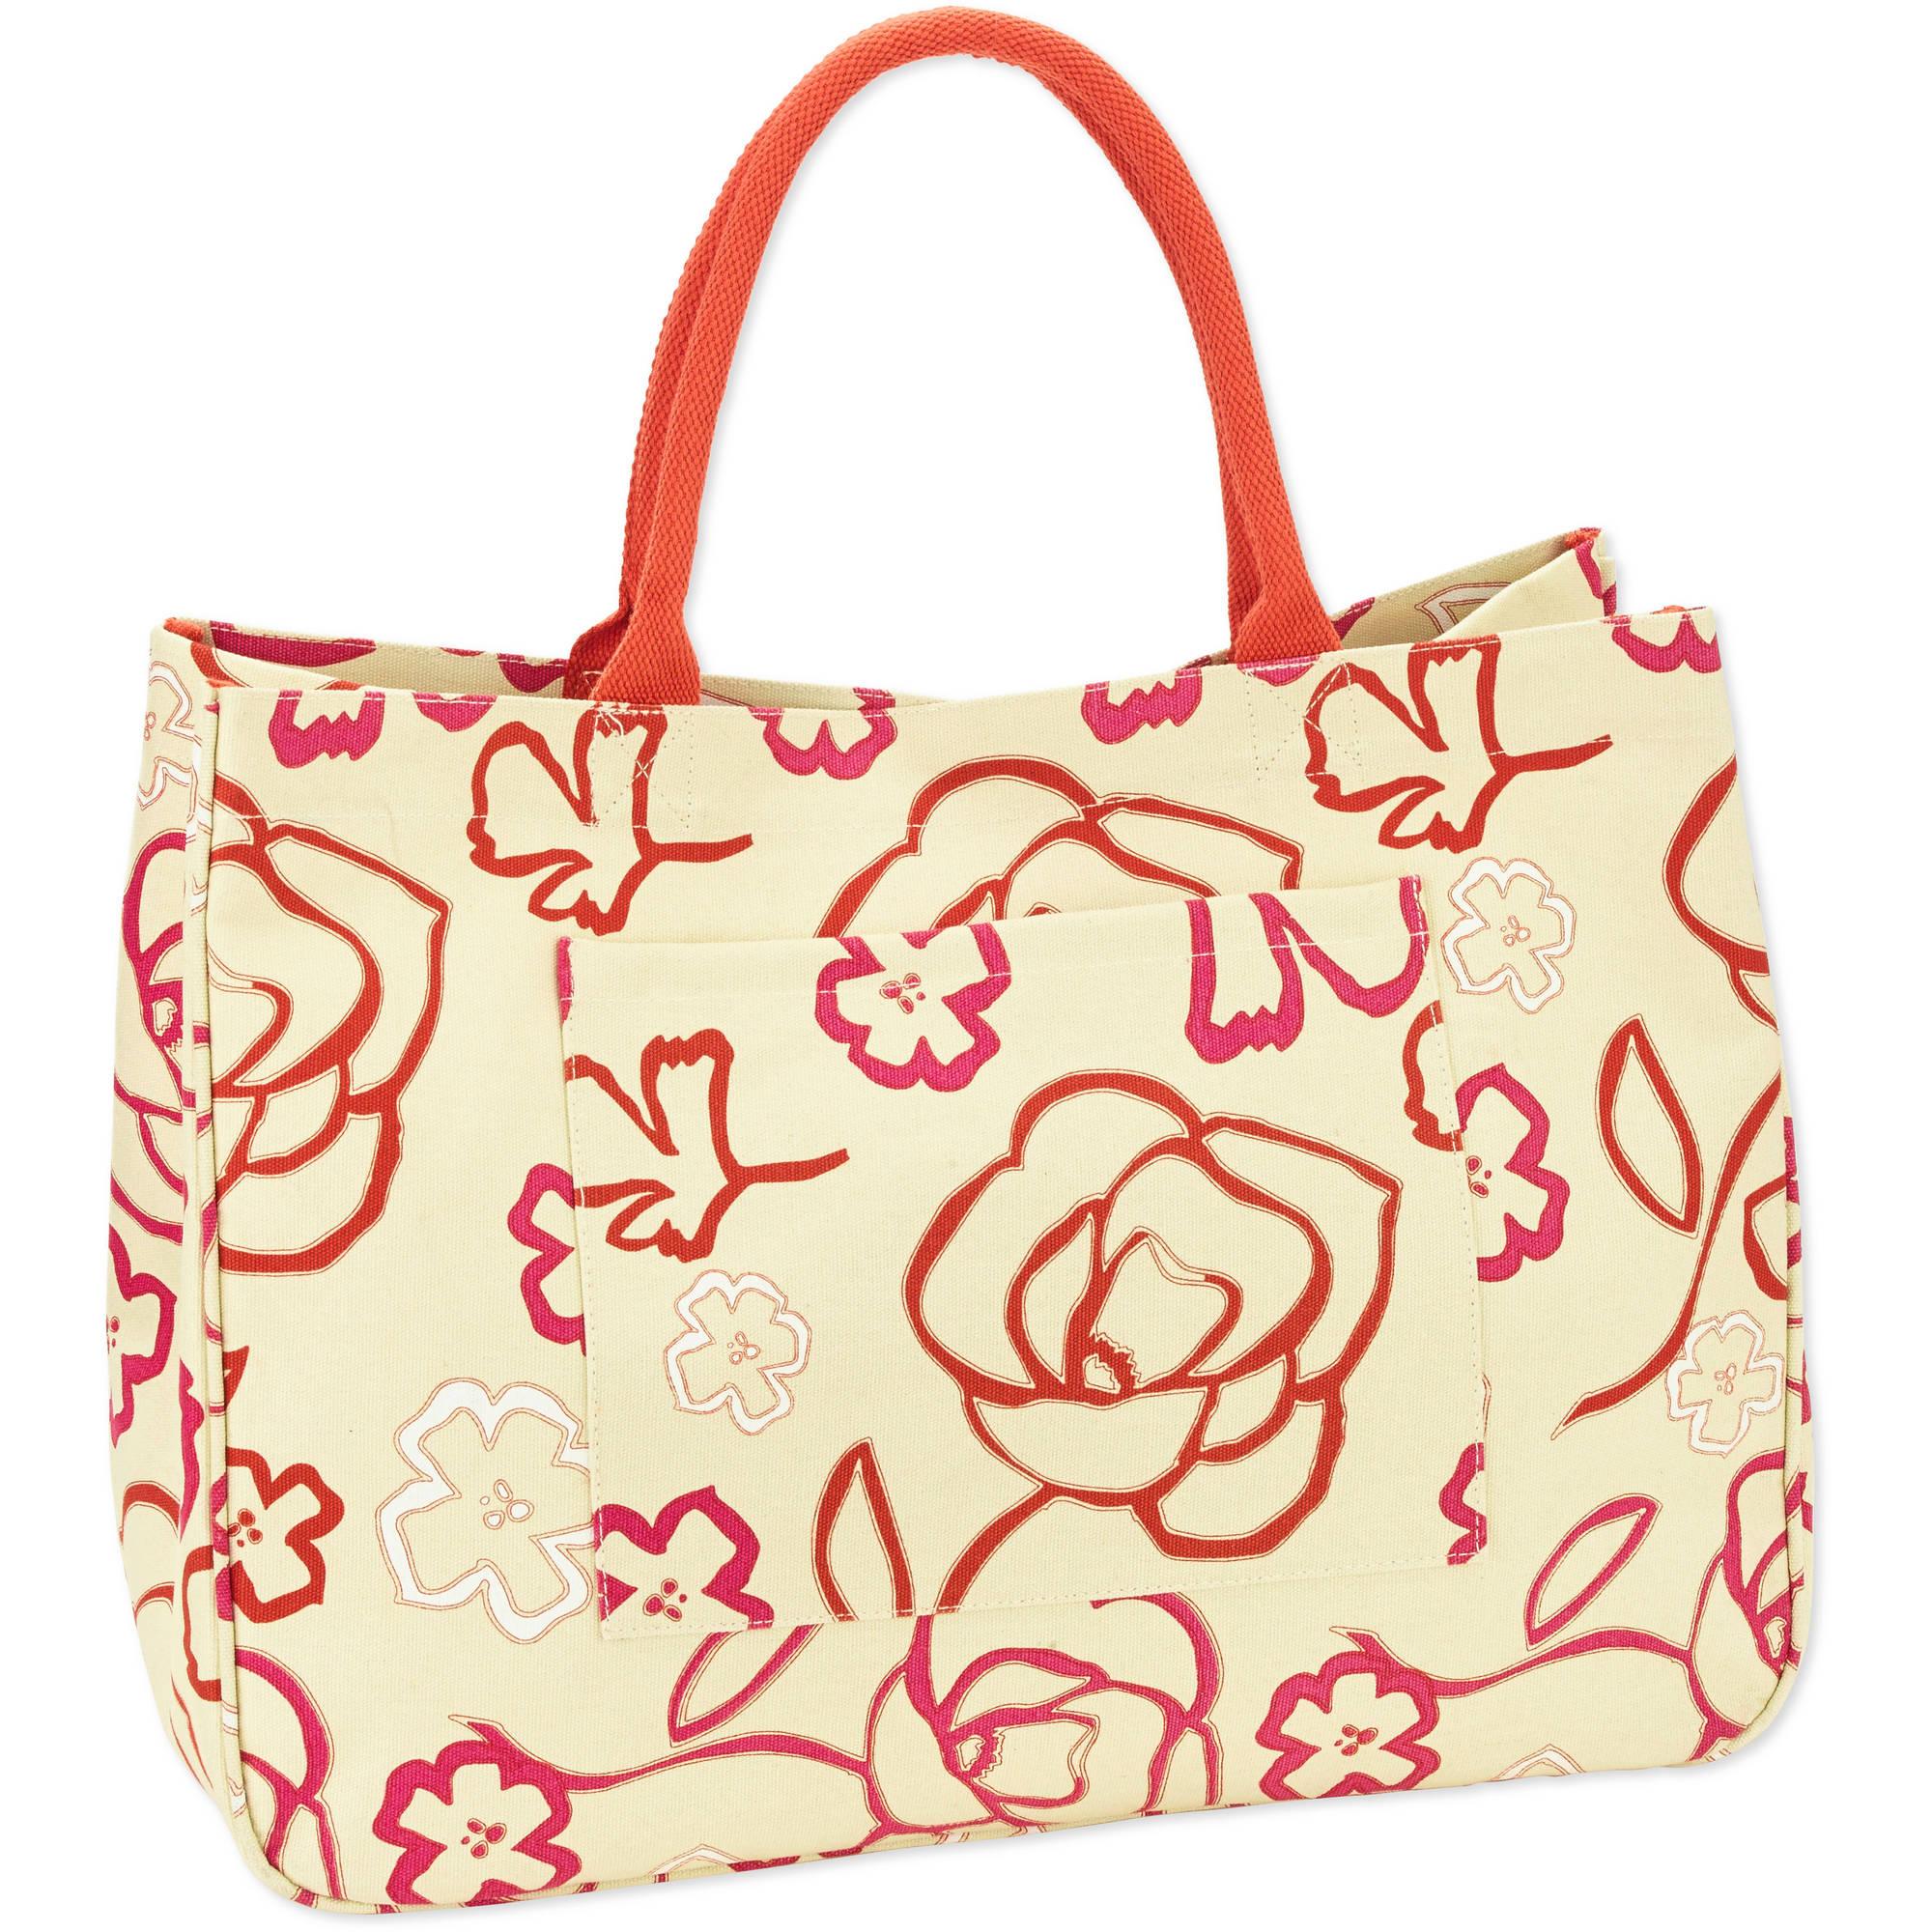 No Boundaries 20''Women's Printed Canvas Tote Beach Bag